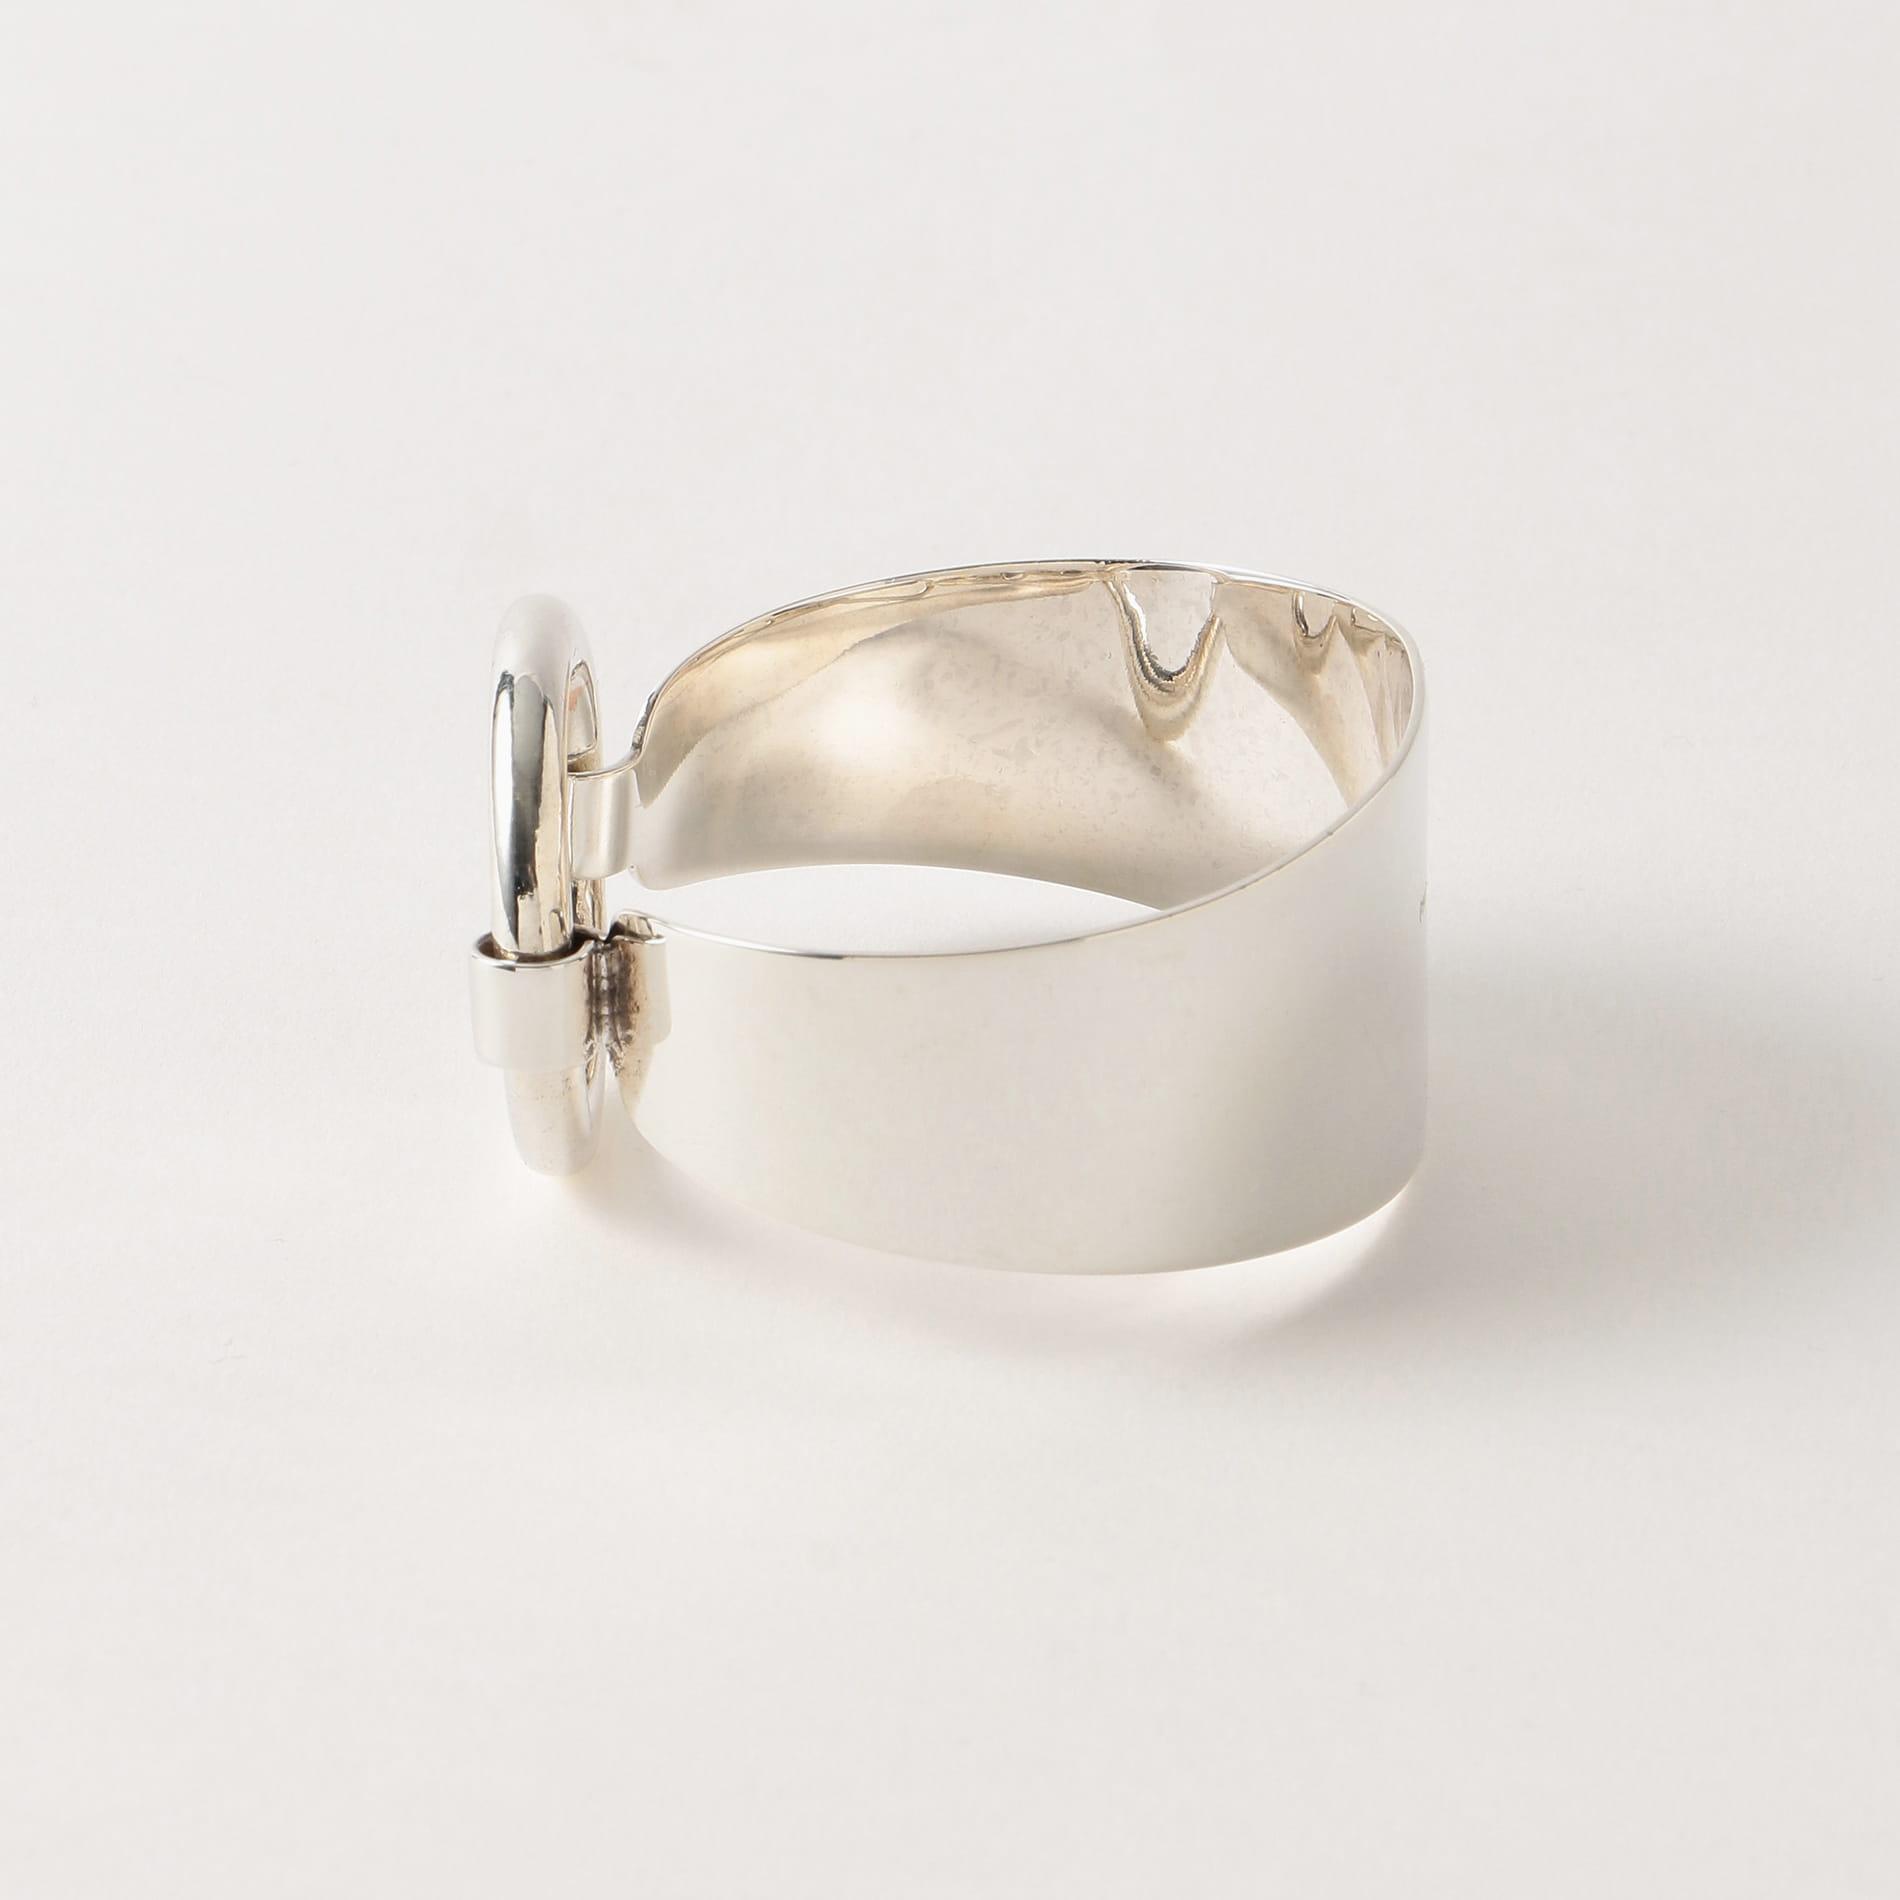 【PHILIPPE AUDIBERT】WOMEN バングル Sidiner bracelet large brass silver BRS4178